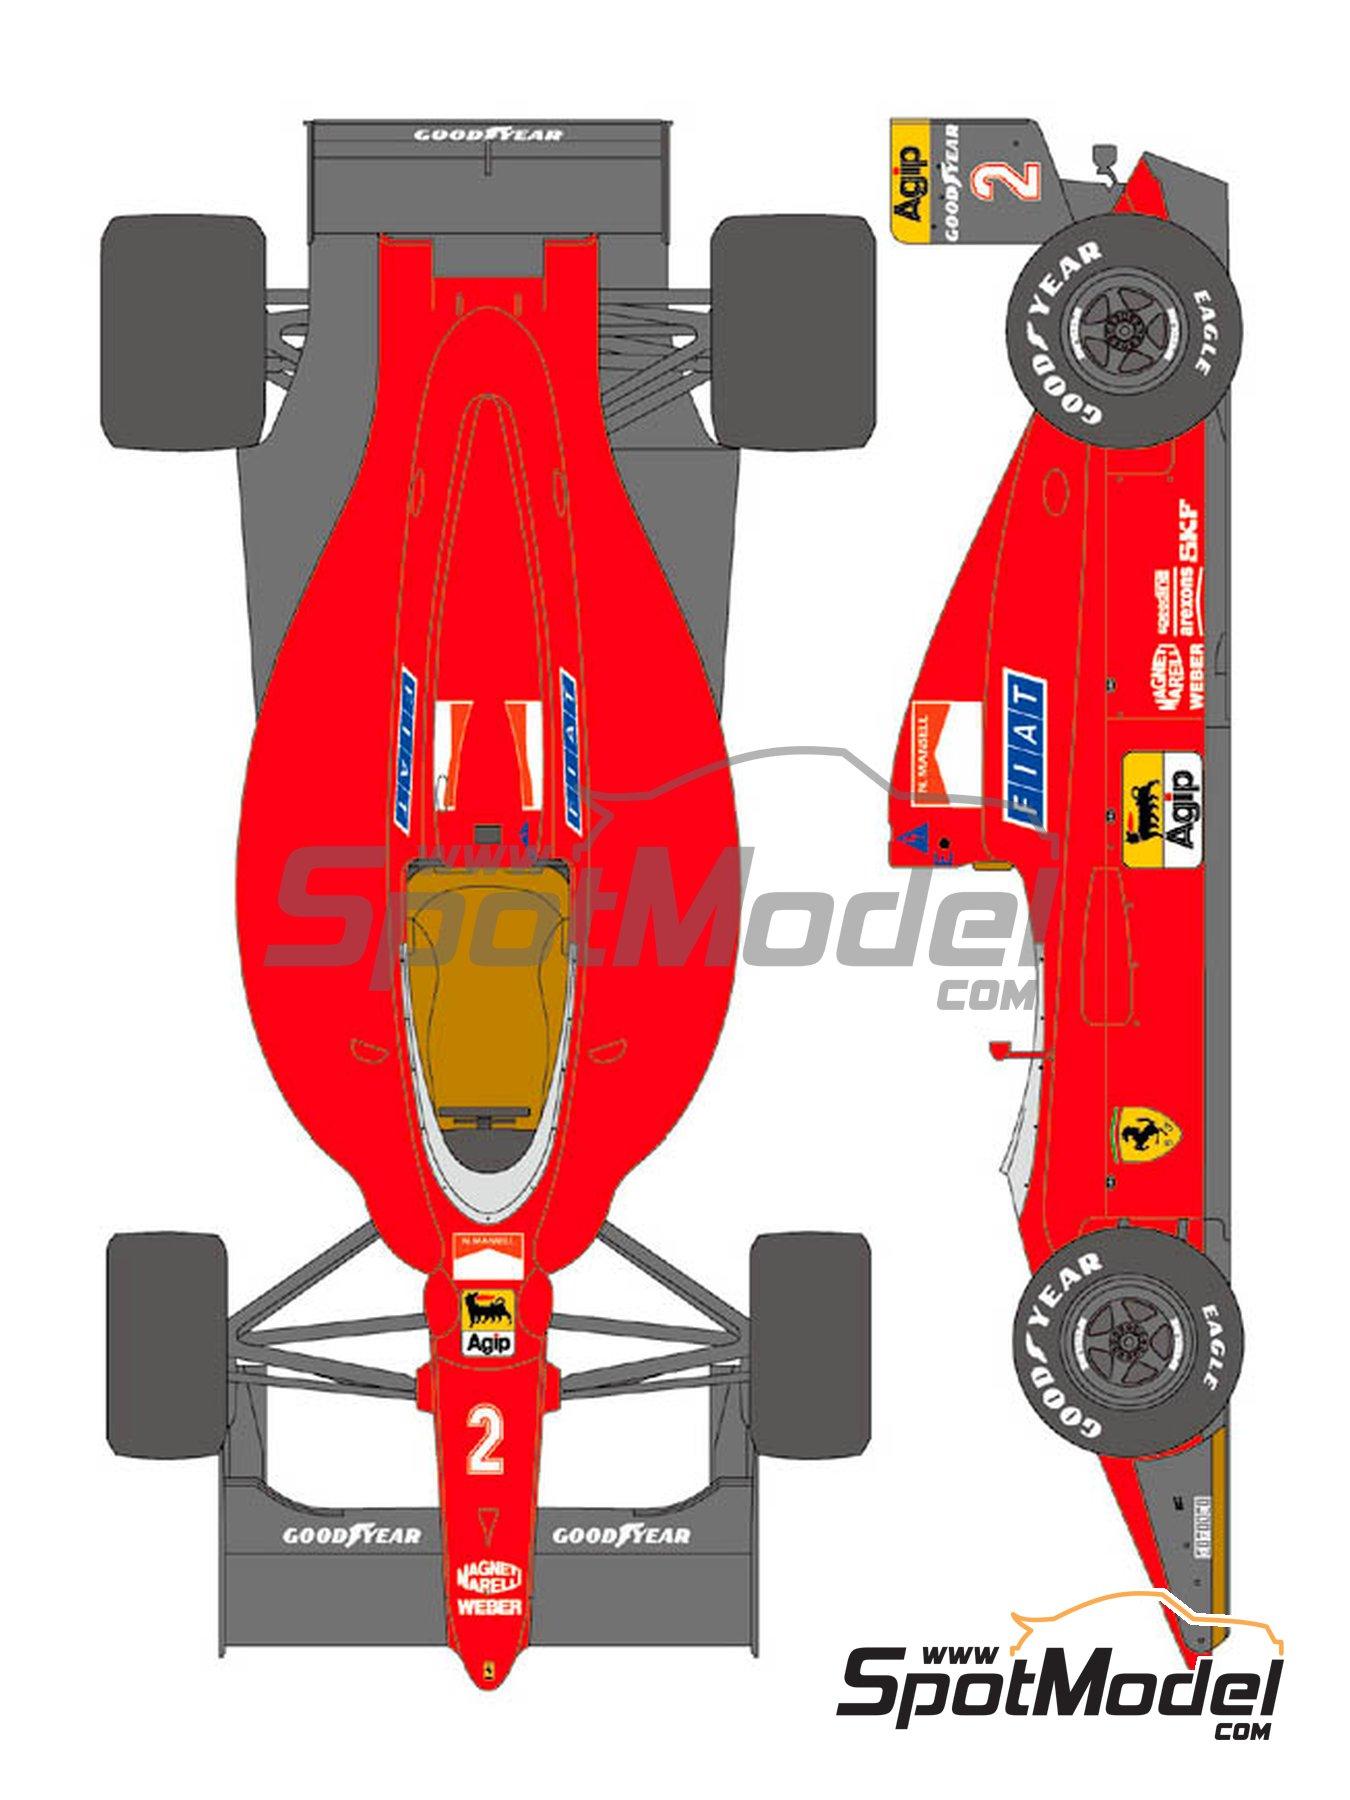 Ferrari 641/2 F1-90 Agip Fiat - Gran Premio de Fórmula 1 de Francia 1990   Decoración en escala1/20 fabricado por Shunko Models (ref.SHK-D356) image